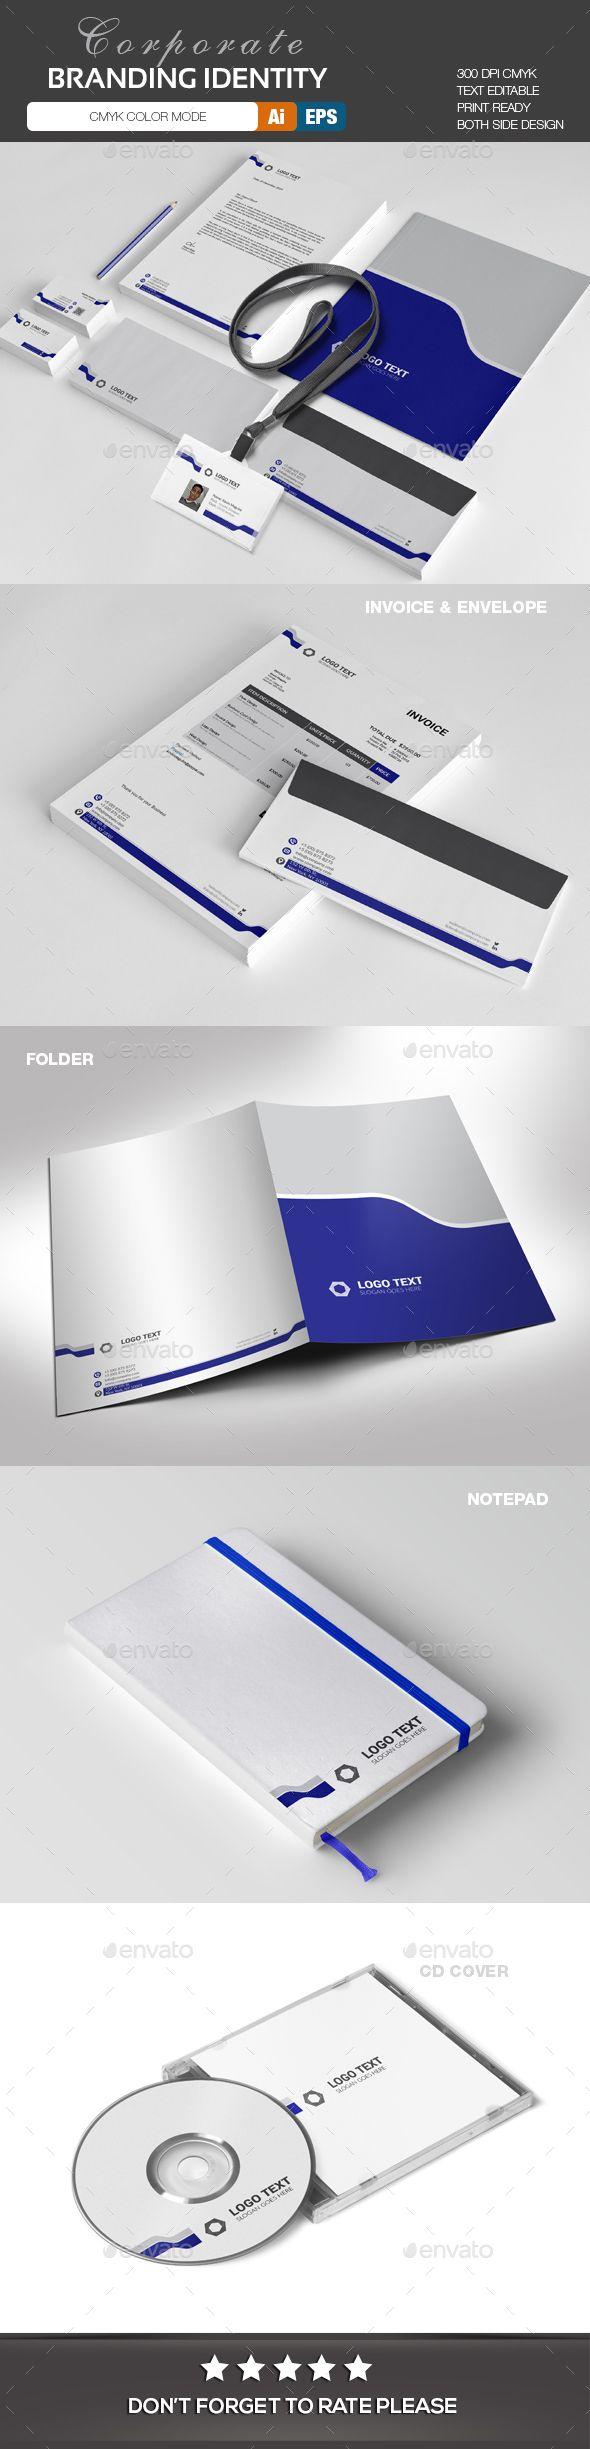 247 best stationery design templates images on pinterest design corporate branding identity template stationery print design spiritdancerdesigns Choice Image